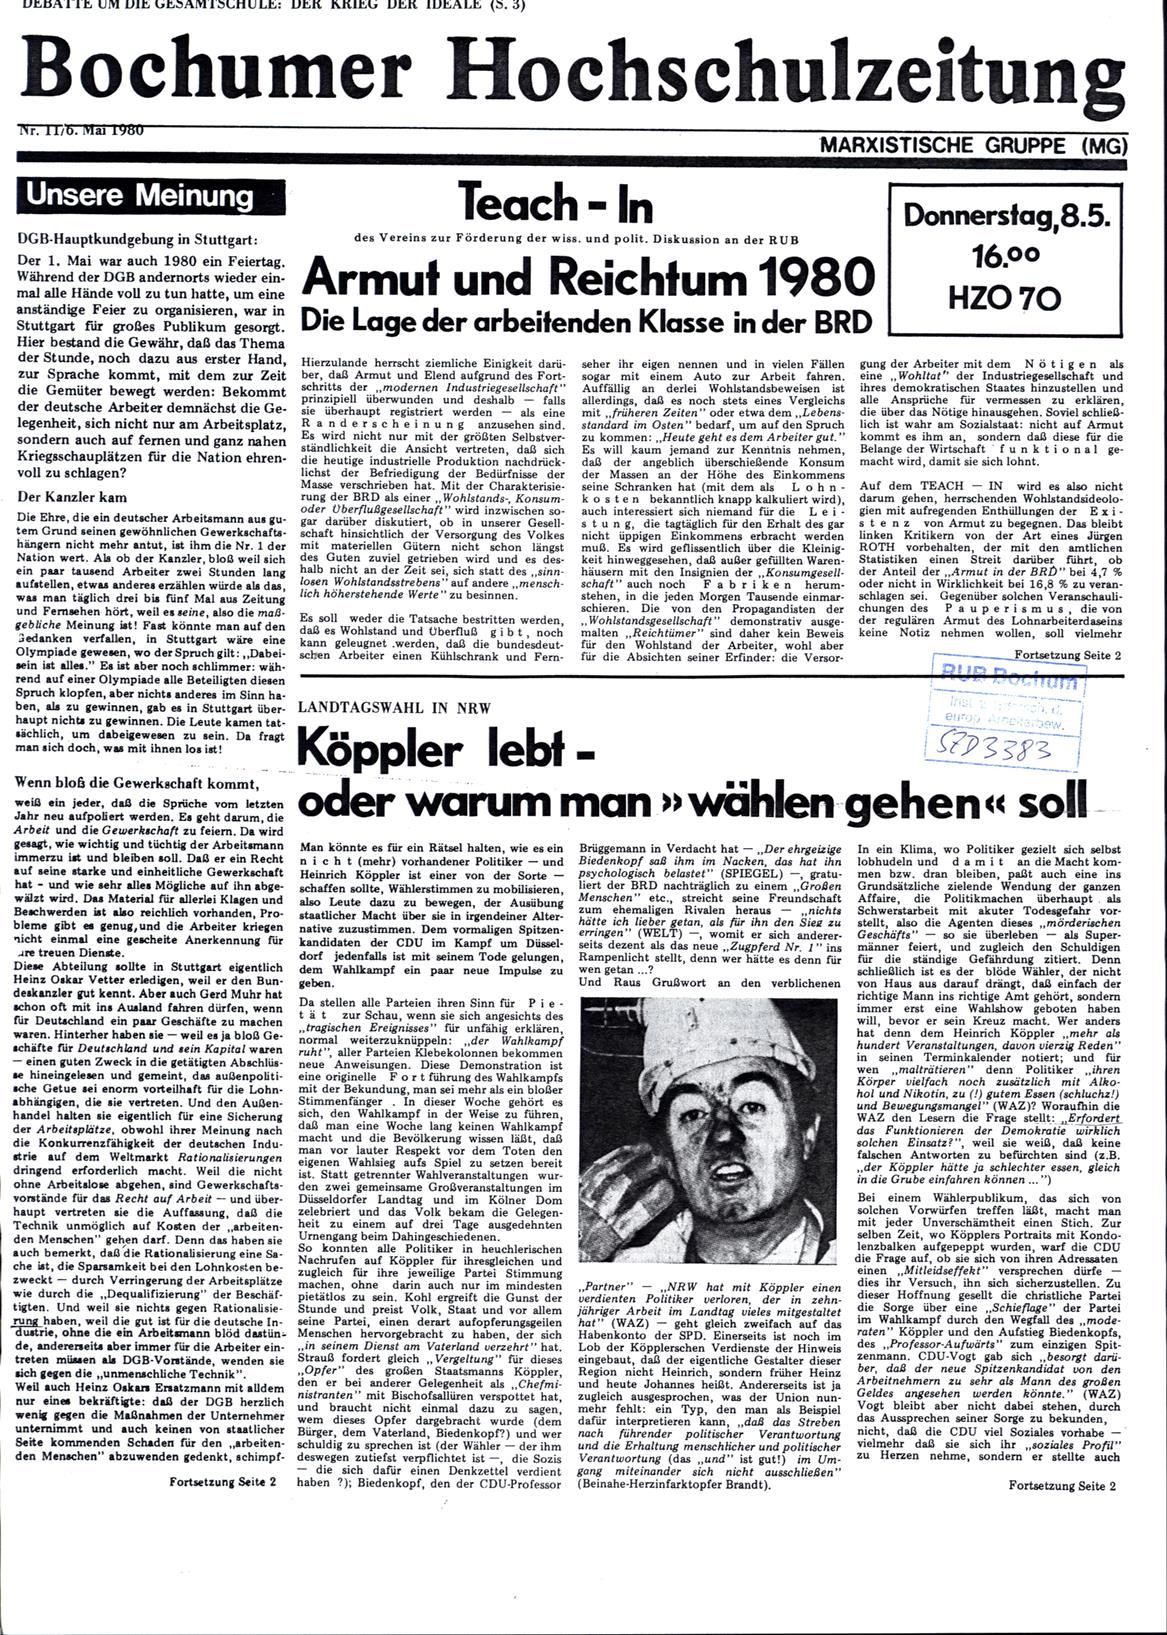 Bochum_BHZ_19800506_011_001